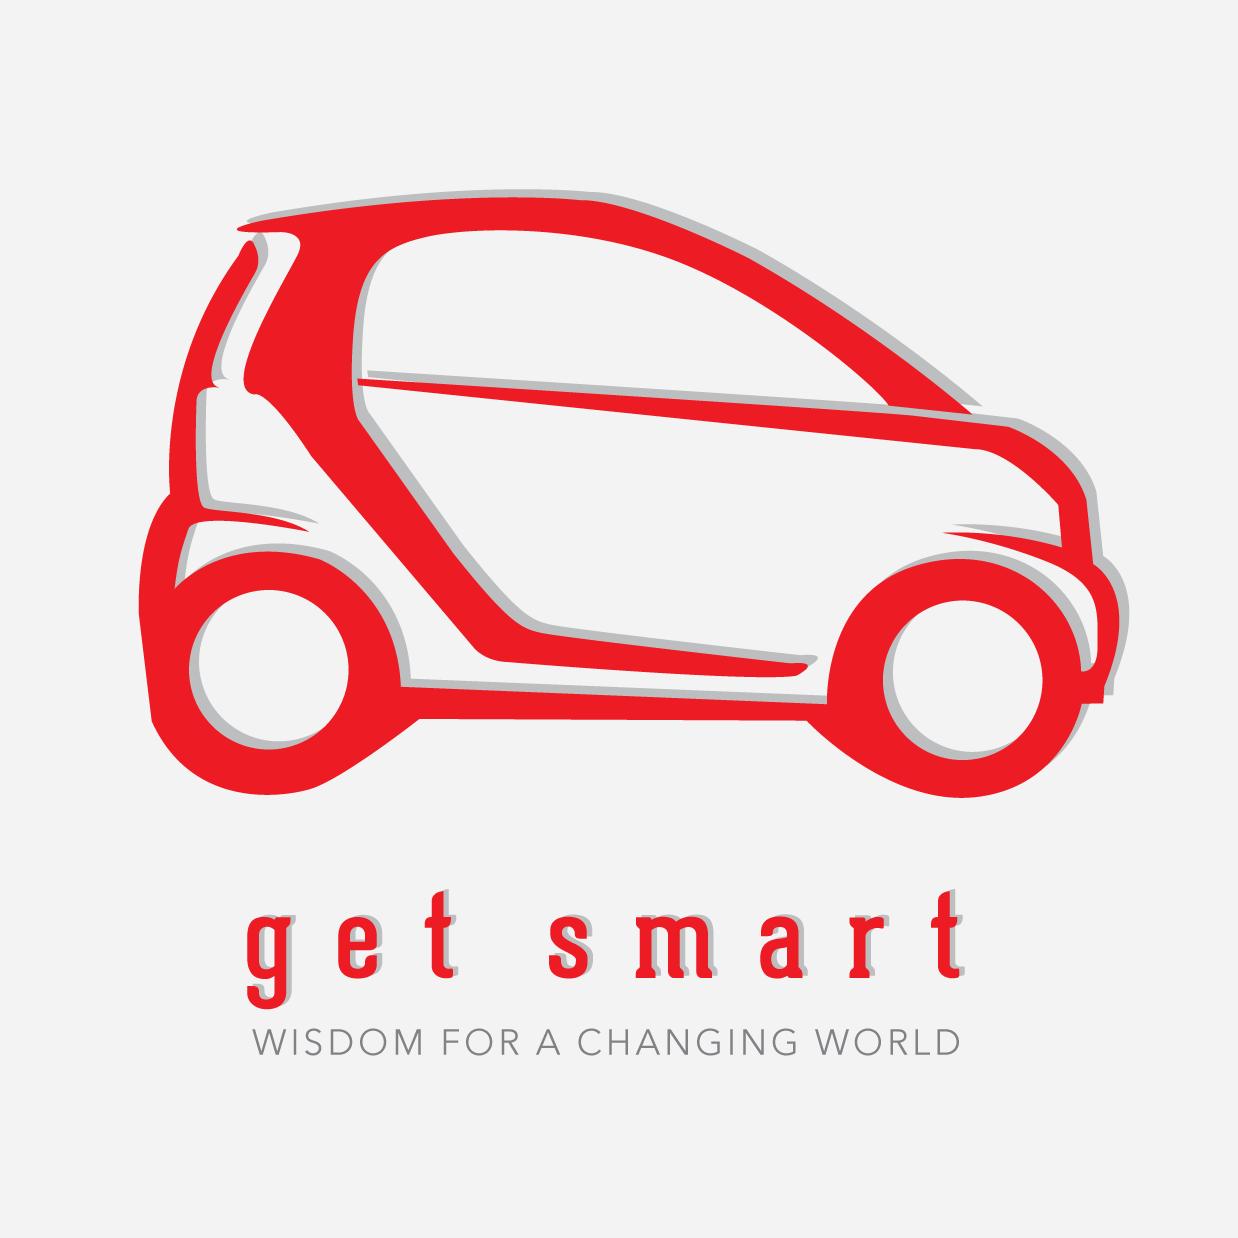 GetSmart_video.png